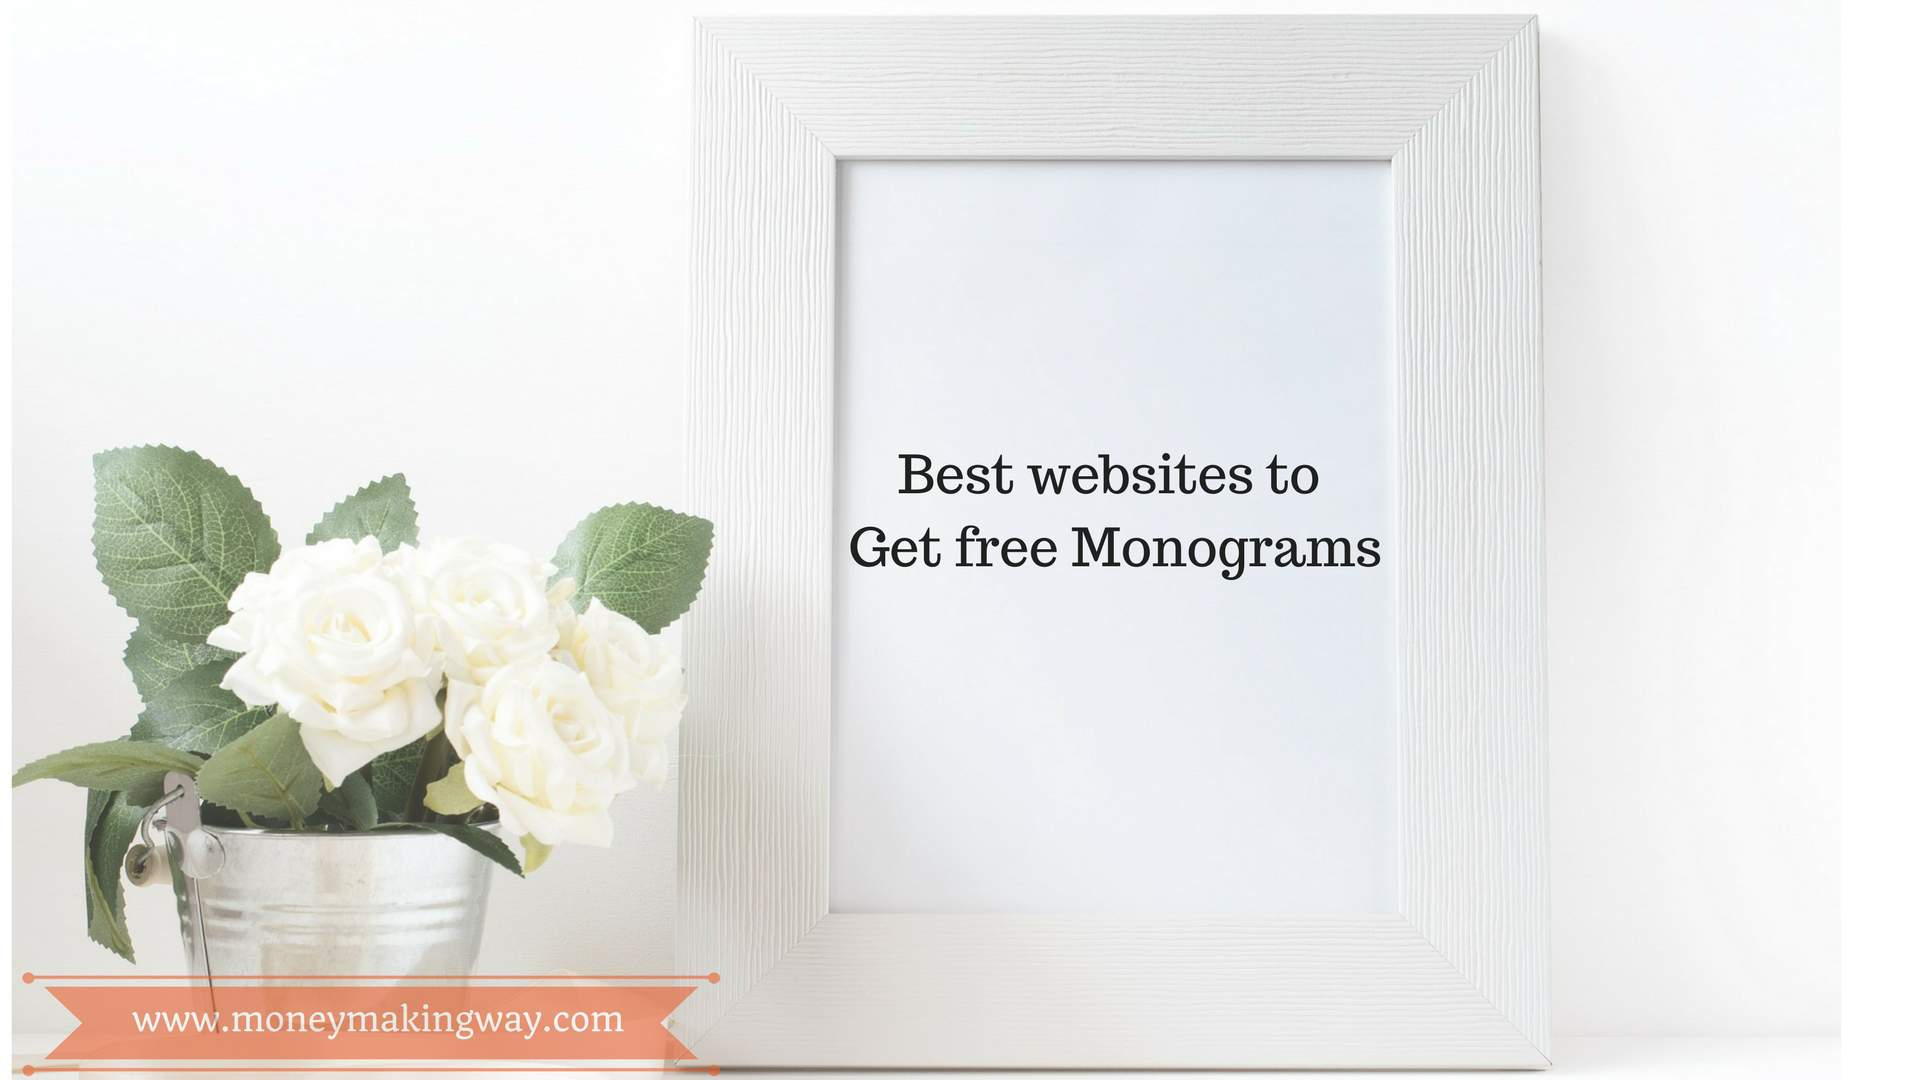 Free Monograms